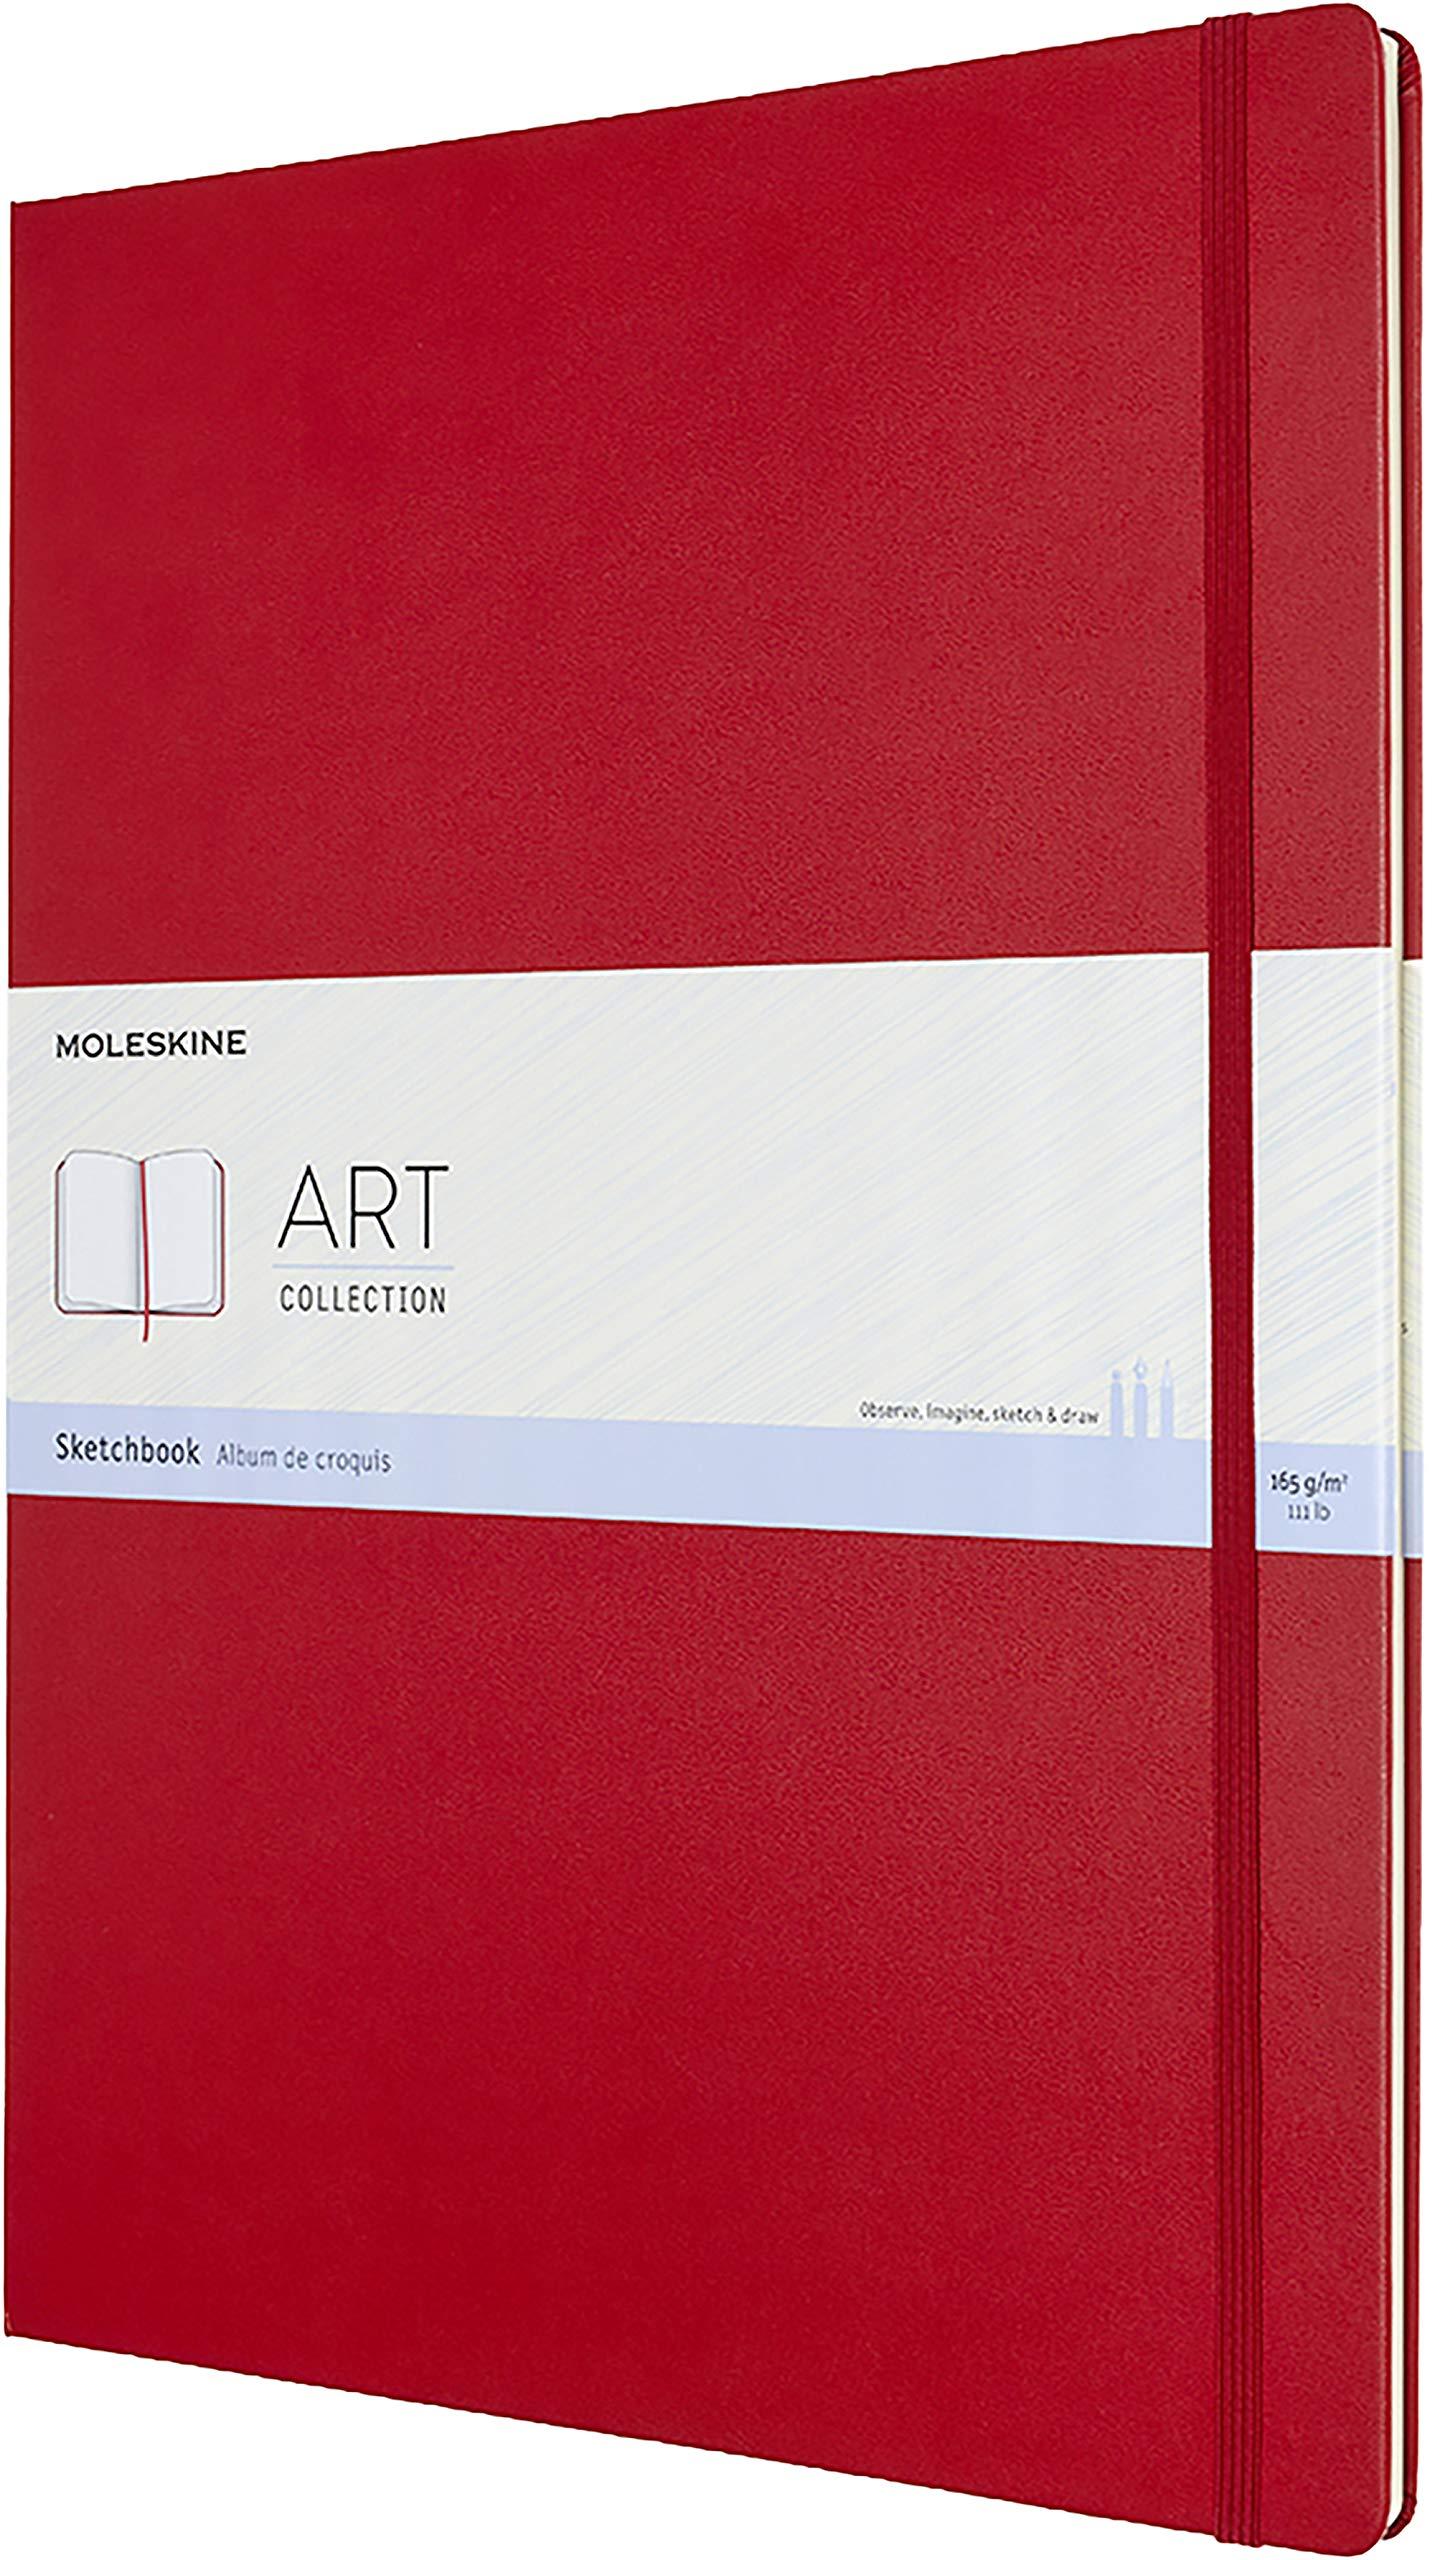 Moleskine Art Sketchbook, Hard Cover, A3 (11.75'' x 16.5'') Plain/Blank, Scarlet Red